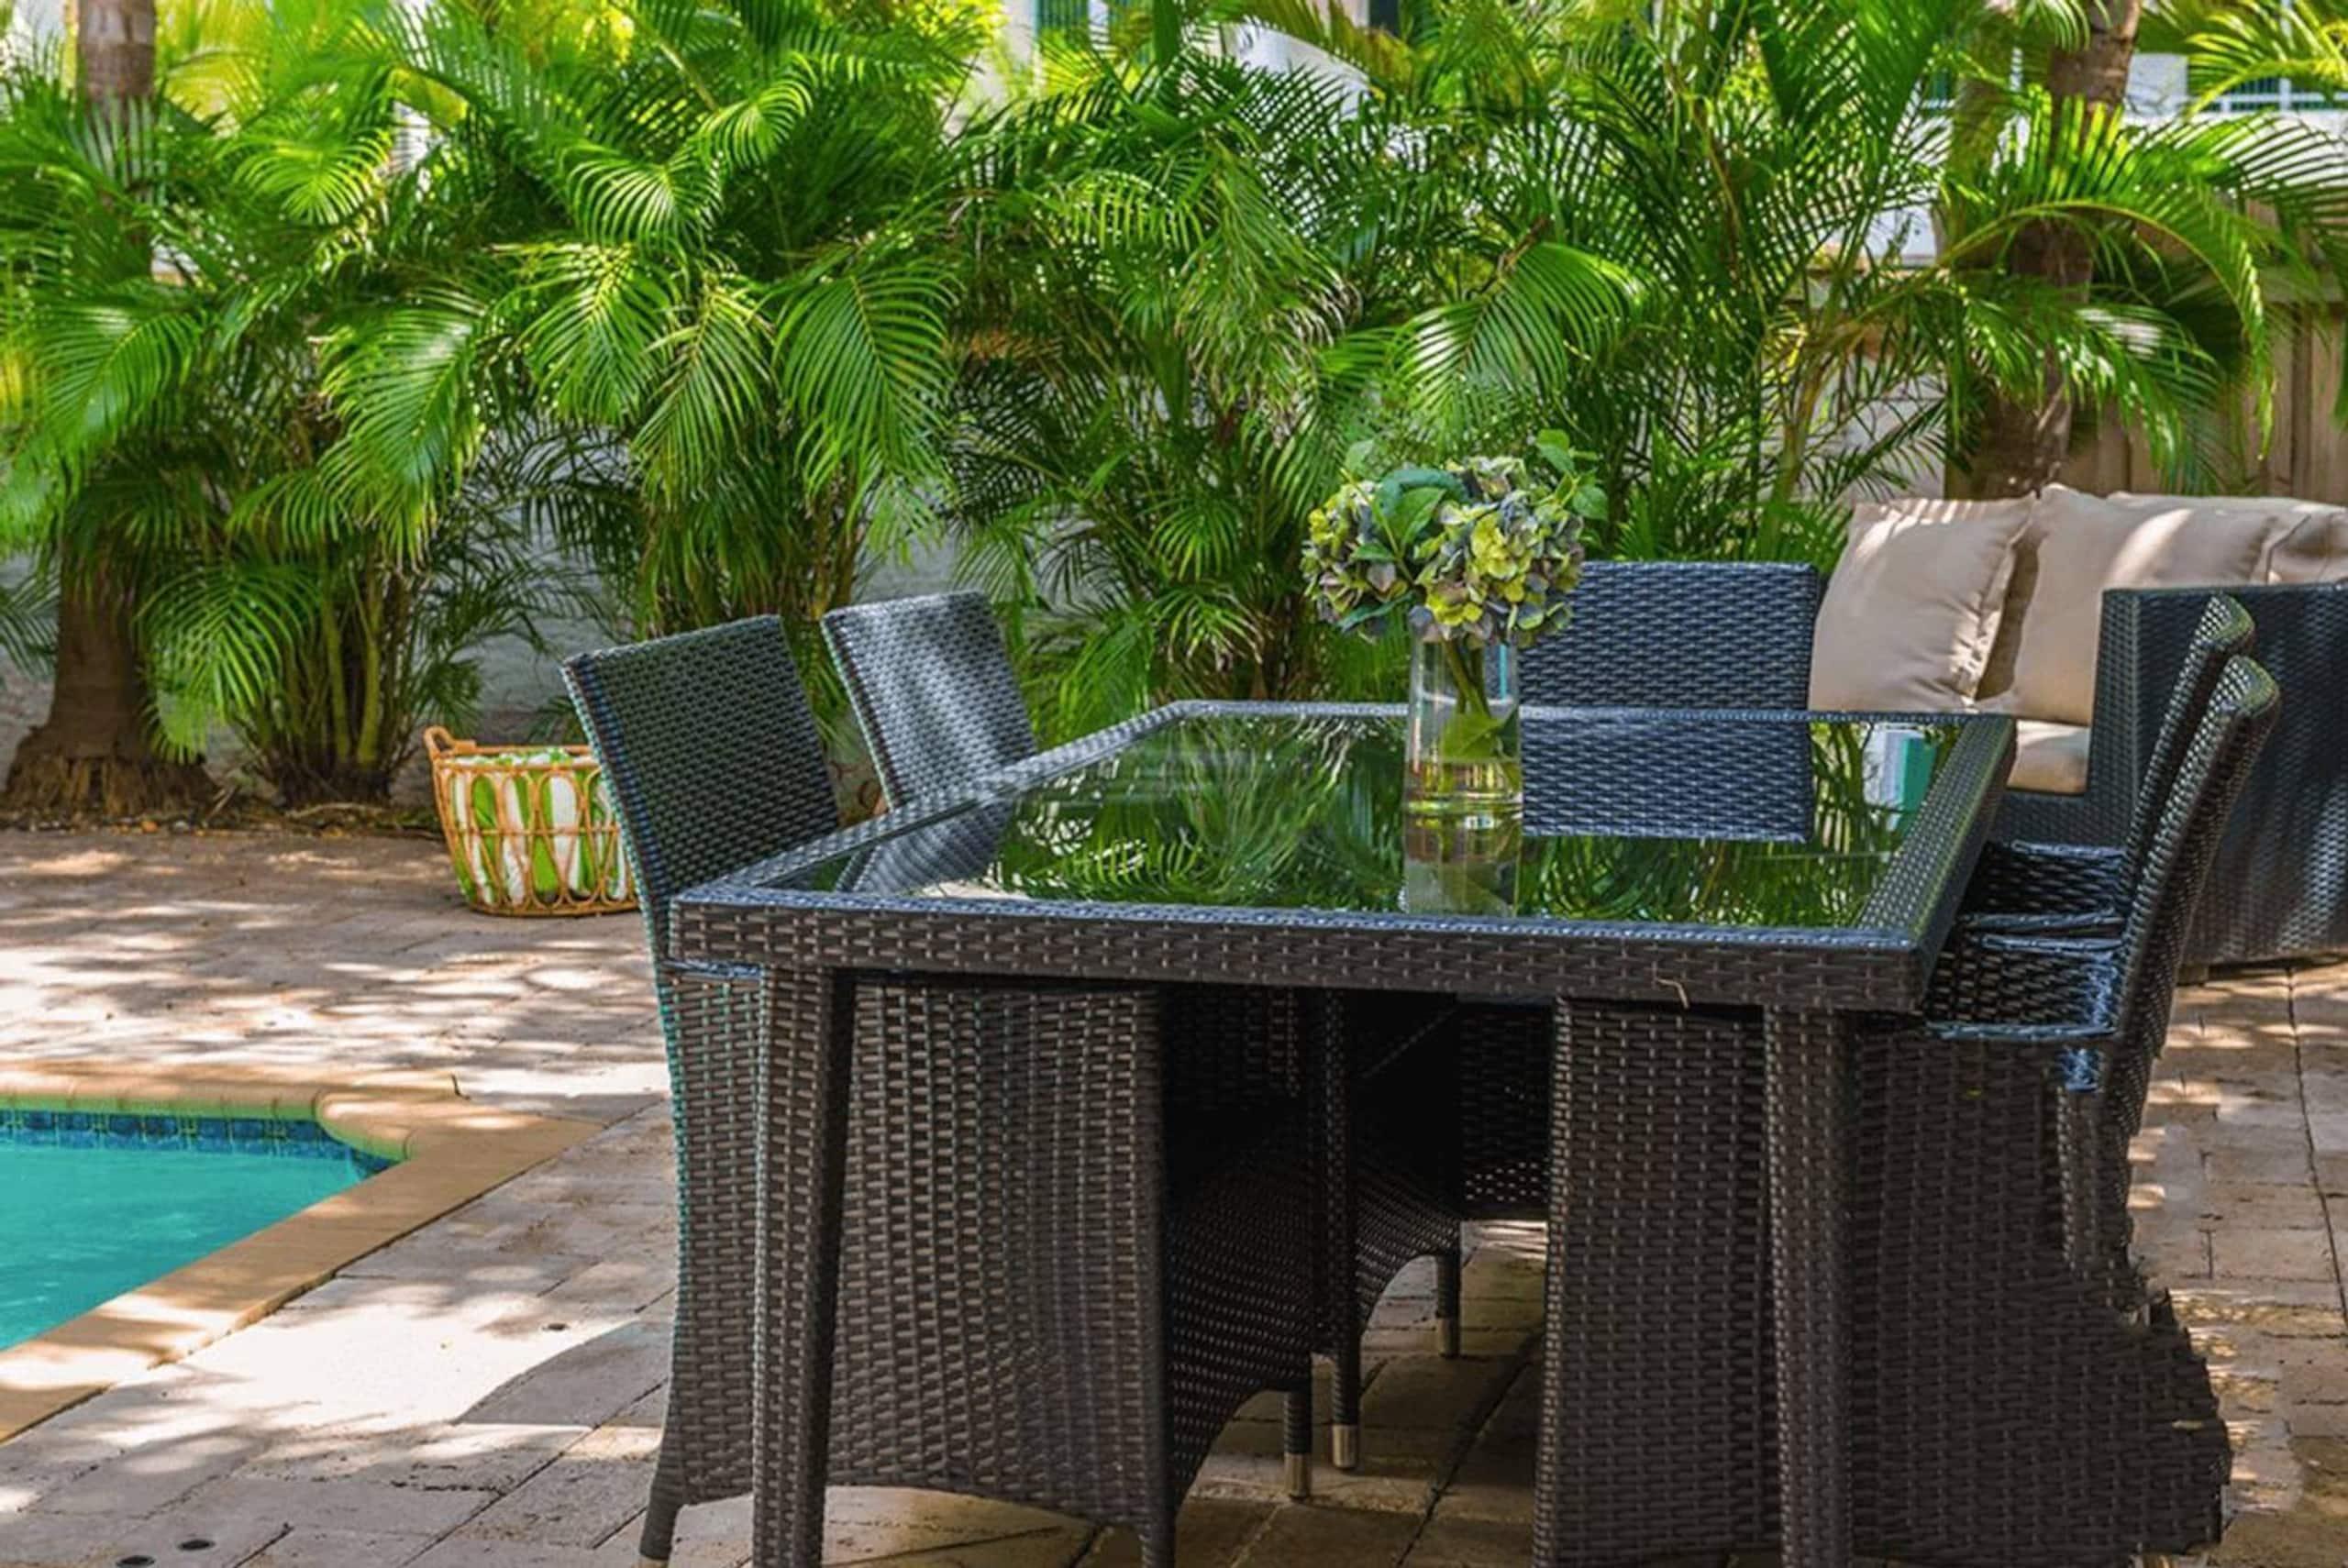 Apartment Villa Lawrence - Luxury Villa photo 22682519